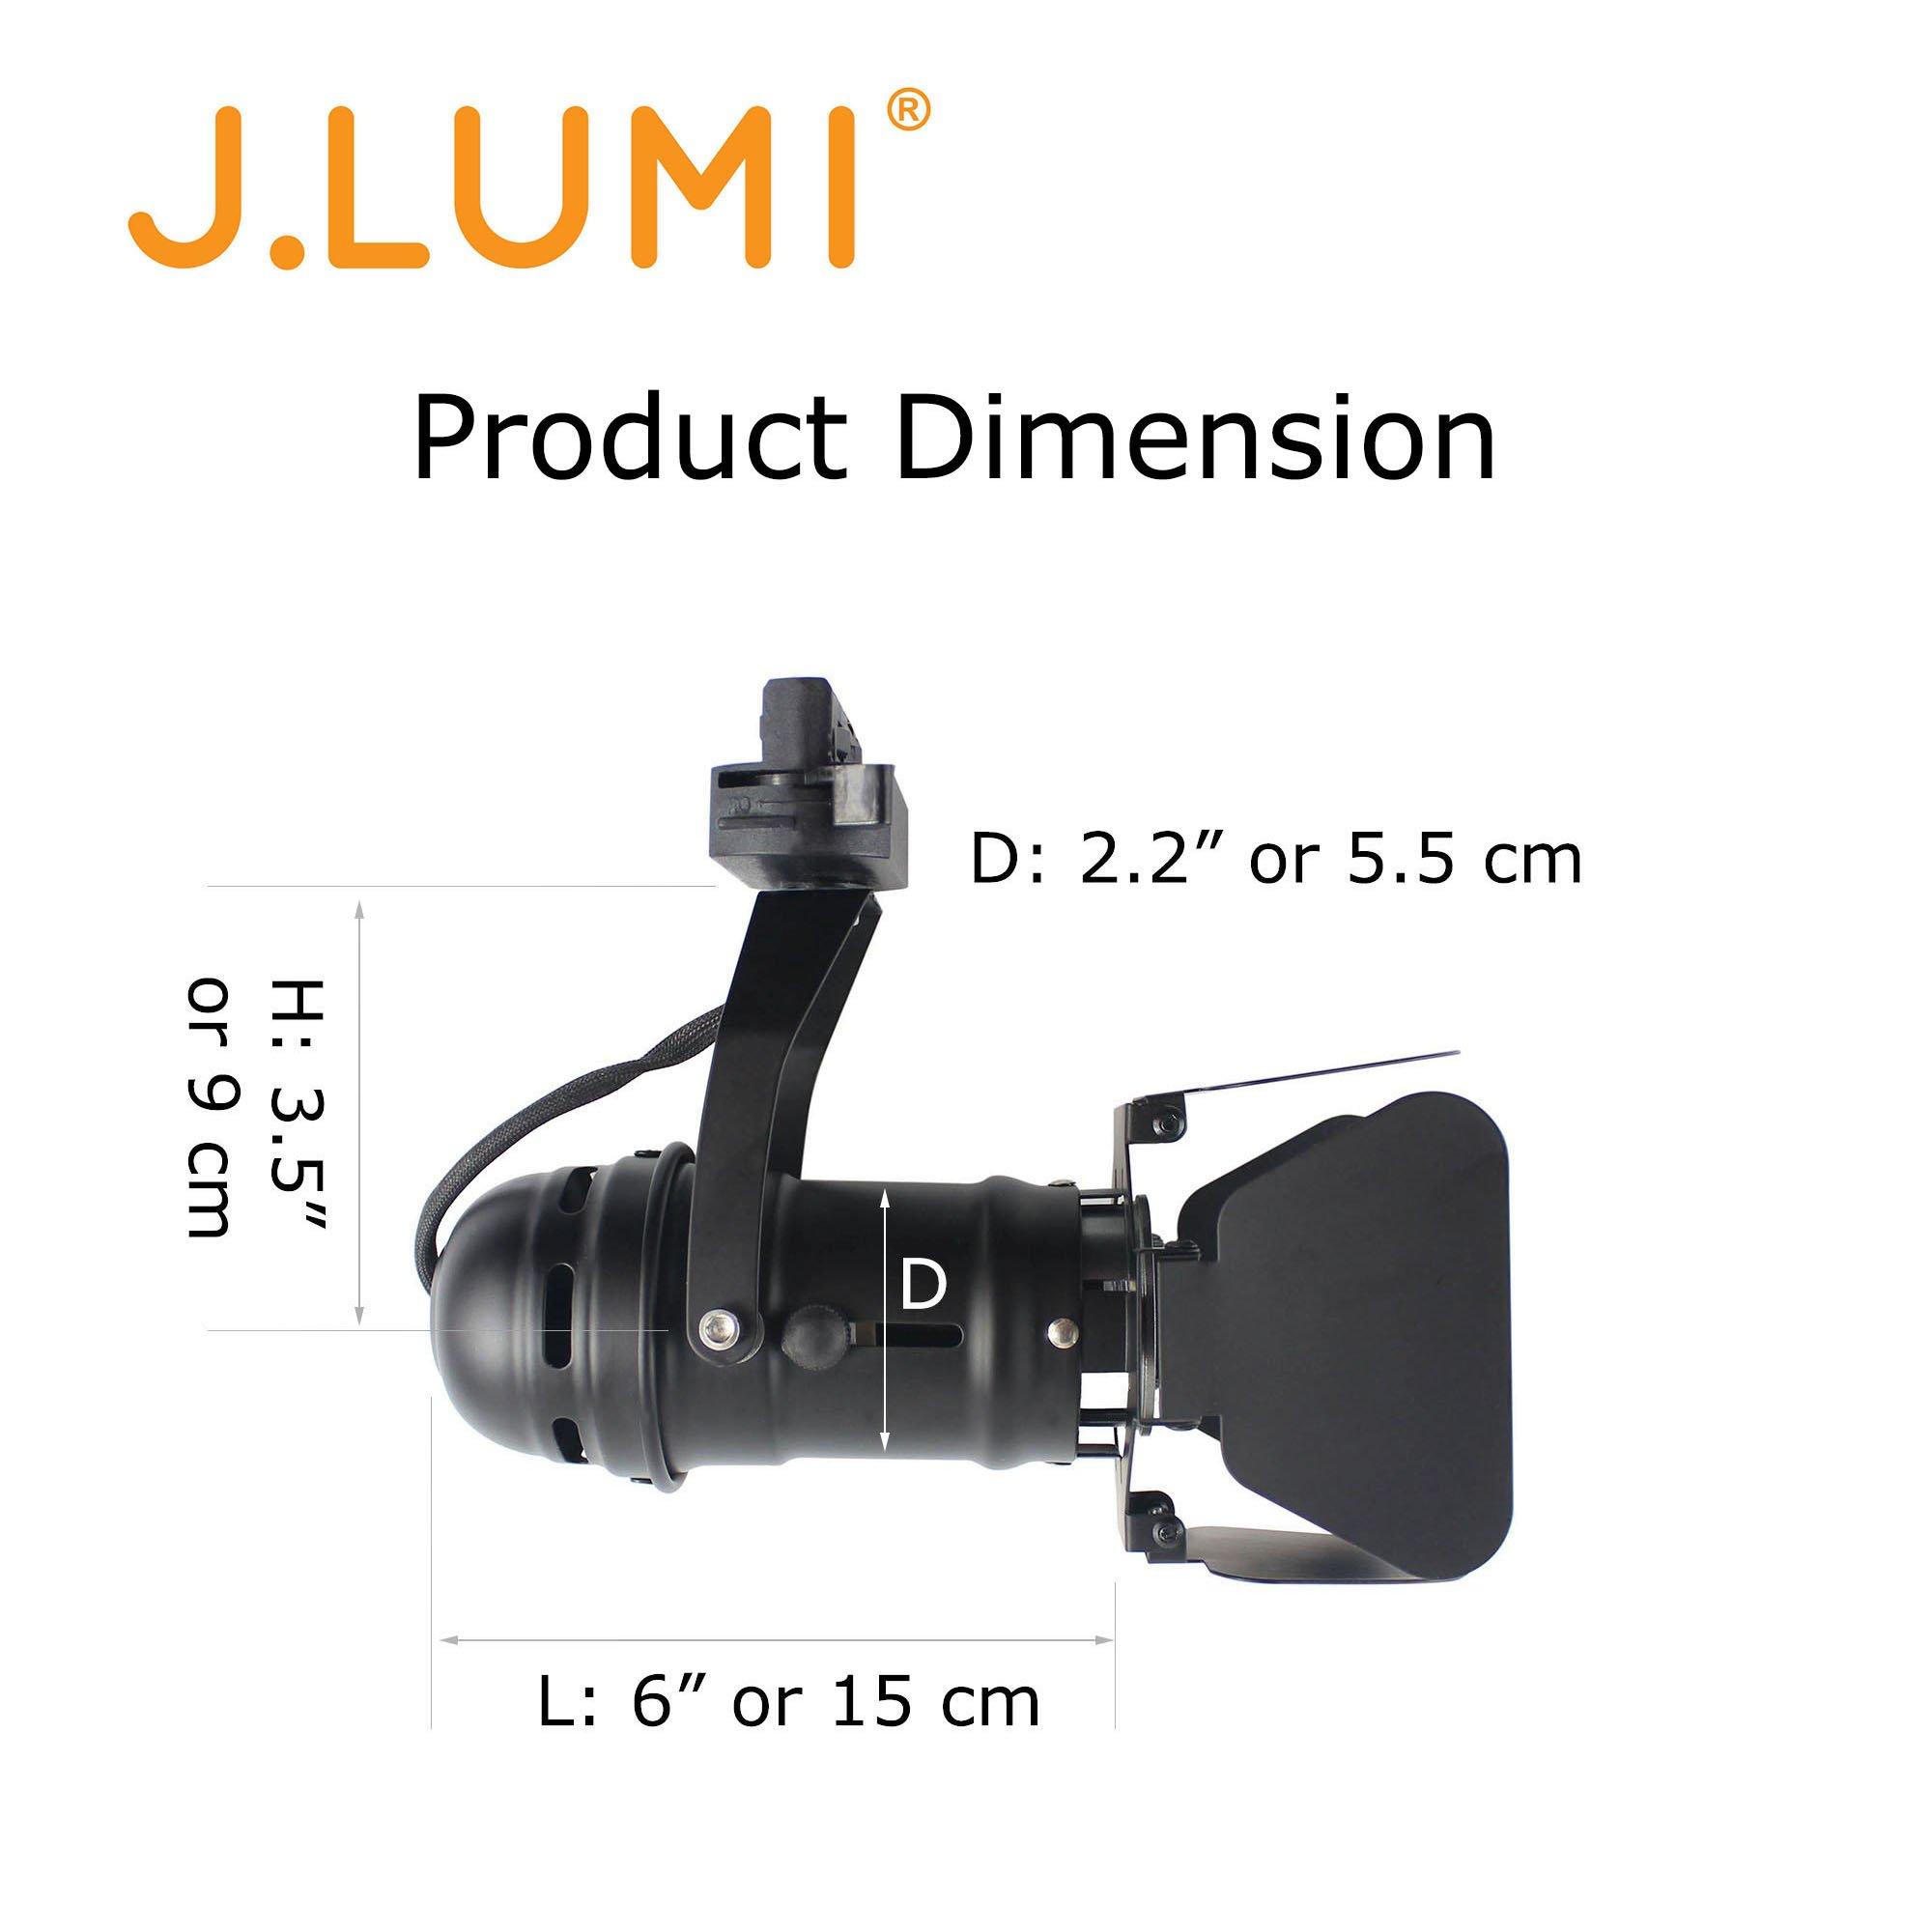 Home Theater Lighting Fixtures: J.LUMI TRK9601 LED Track Lighting Fixture (4-Leaf) Modern